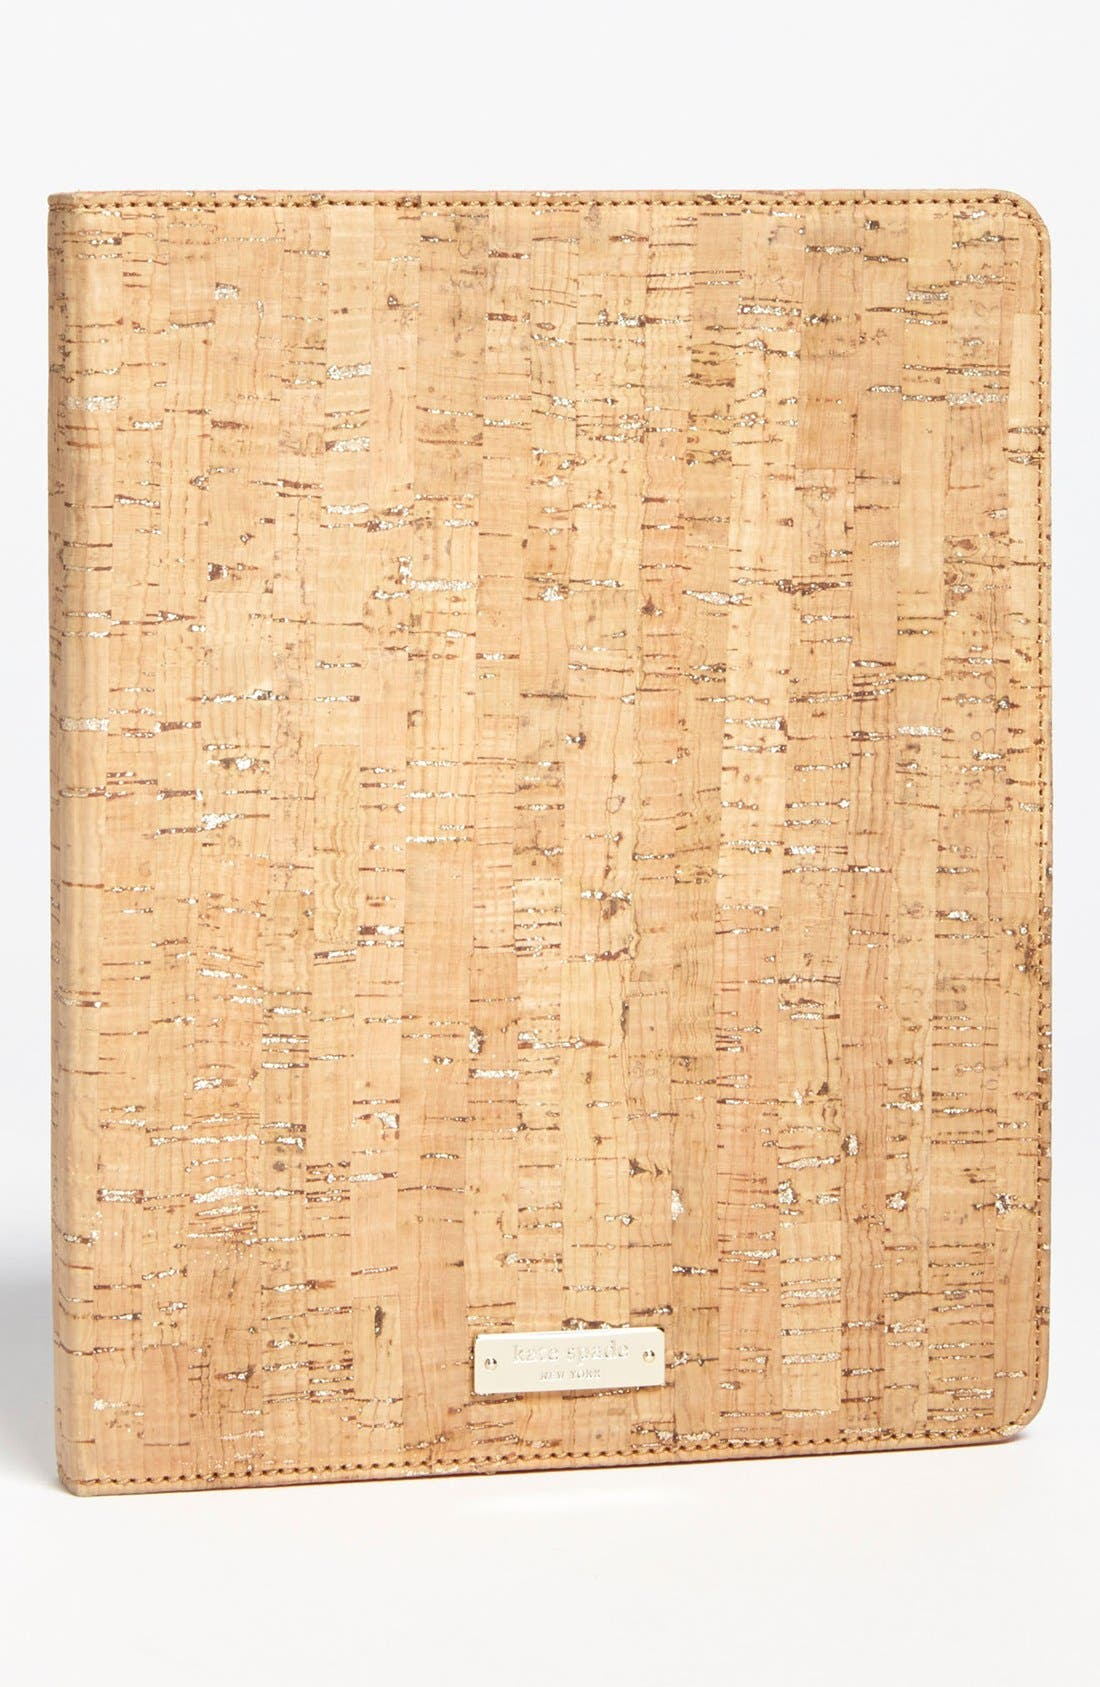 Alternate Image 1 Selected - kate spade new york 'summer cork' iPad 2 & 3 folio